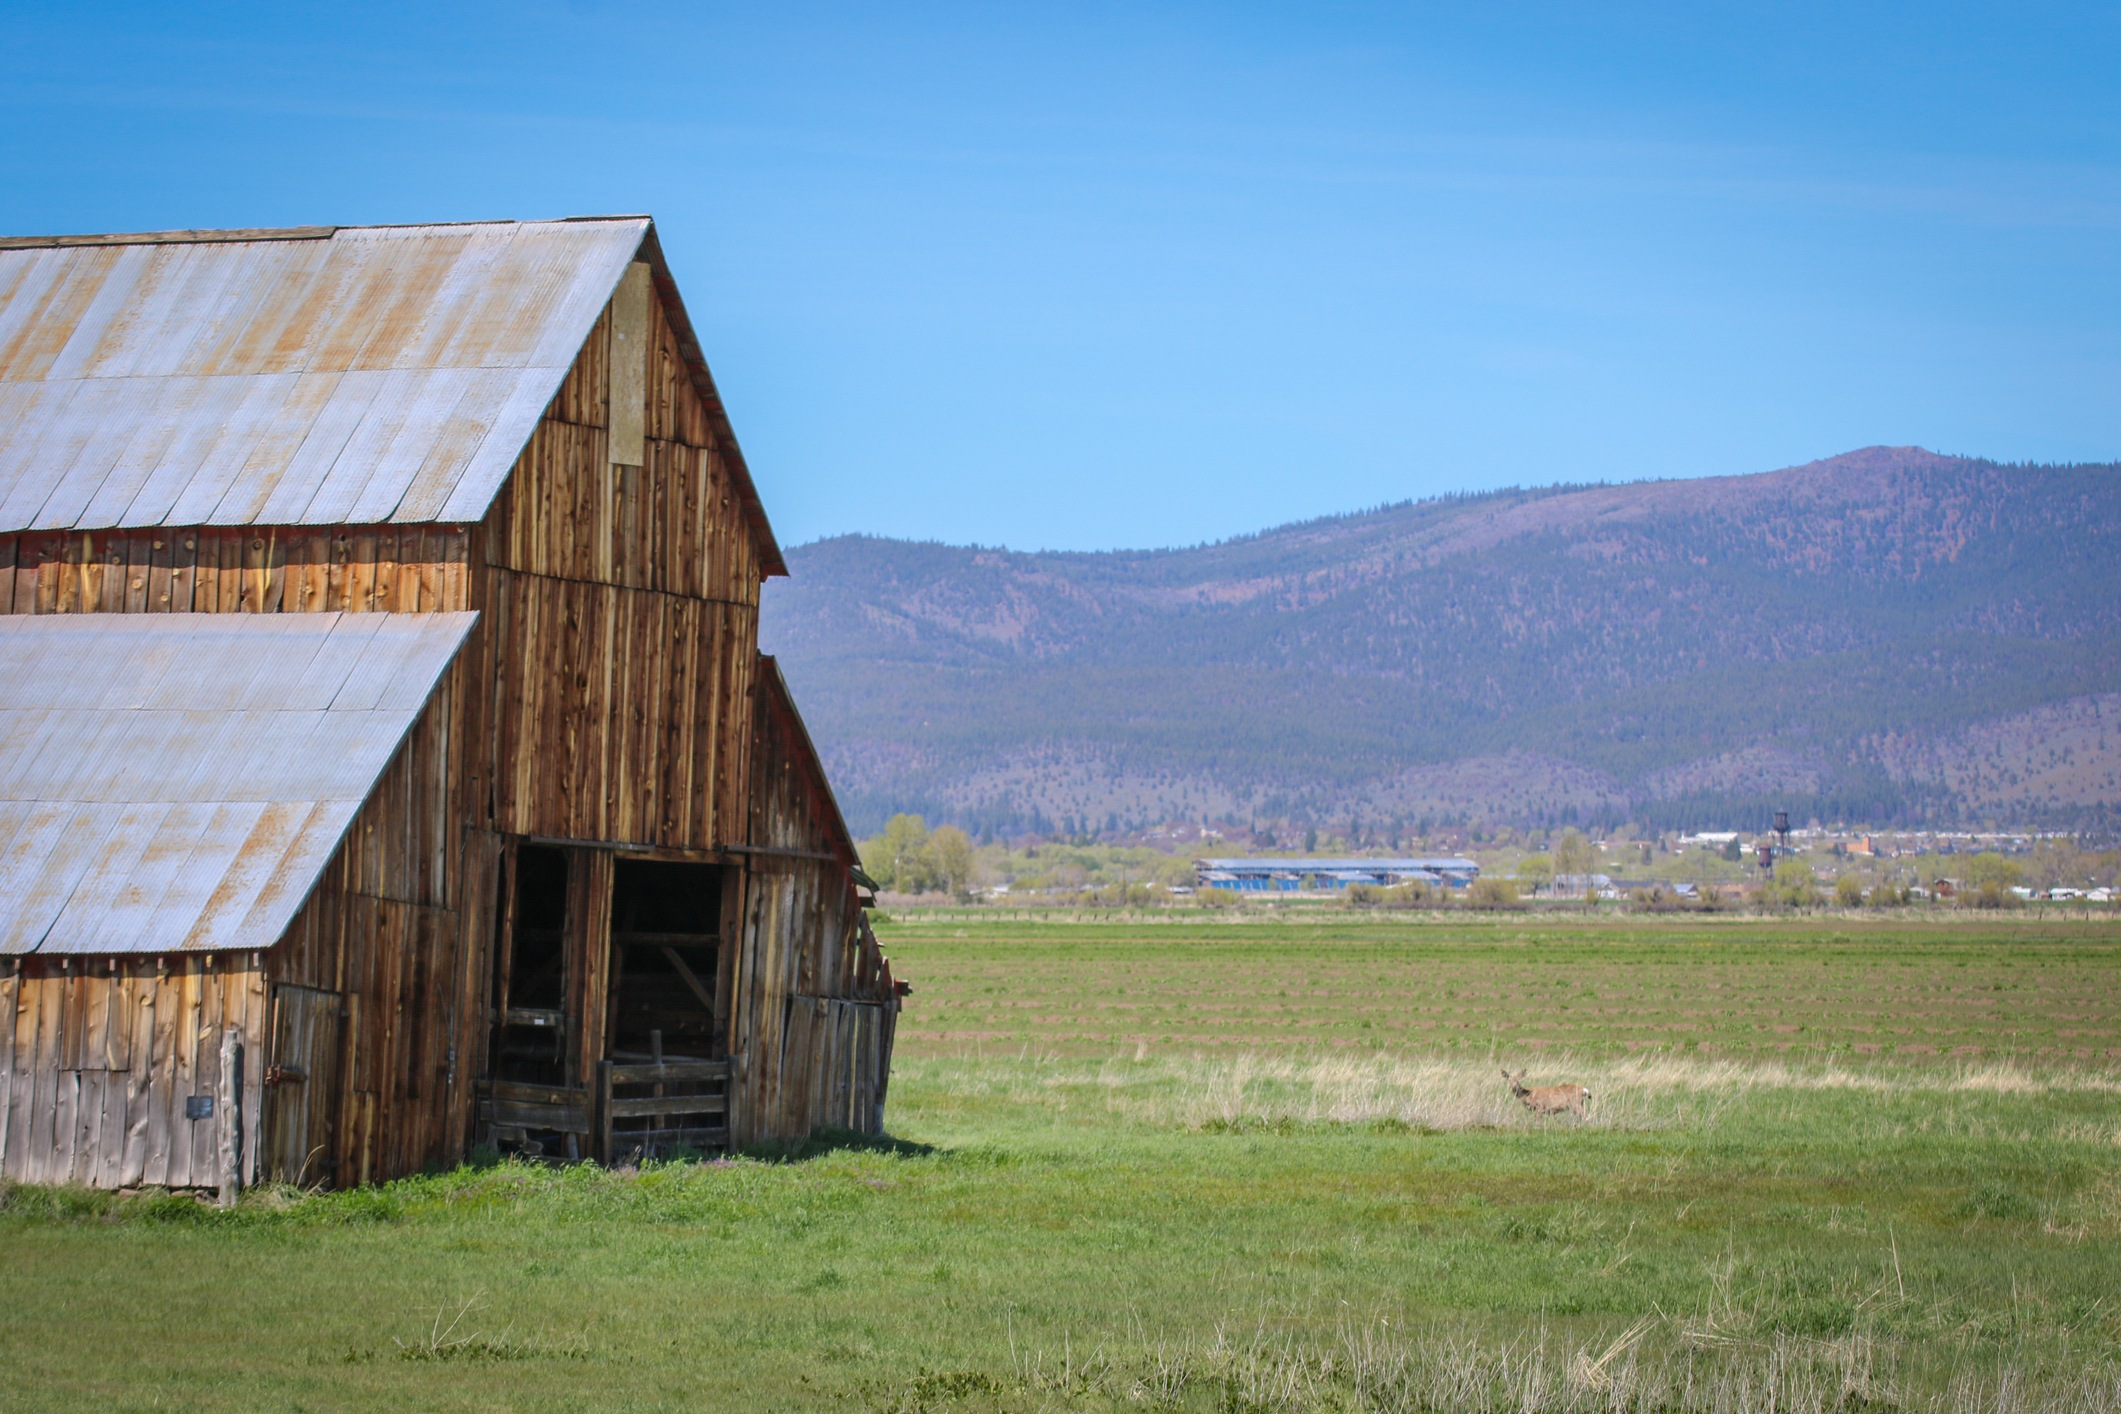 an abandoned barn in a green field